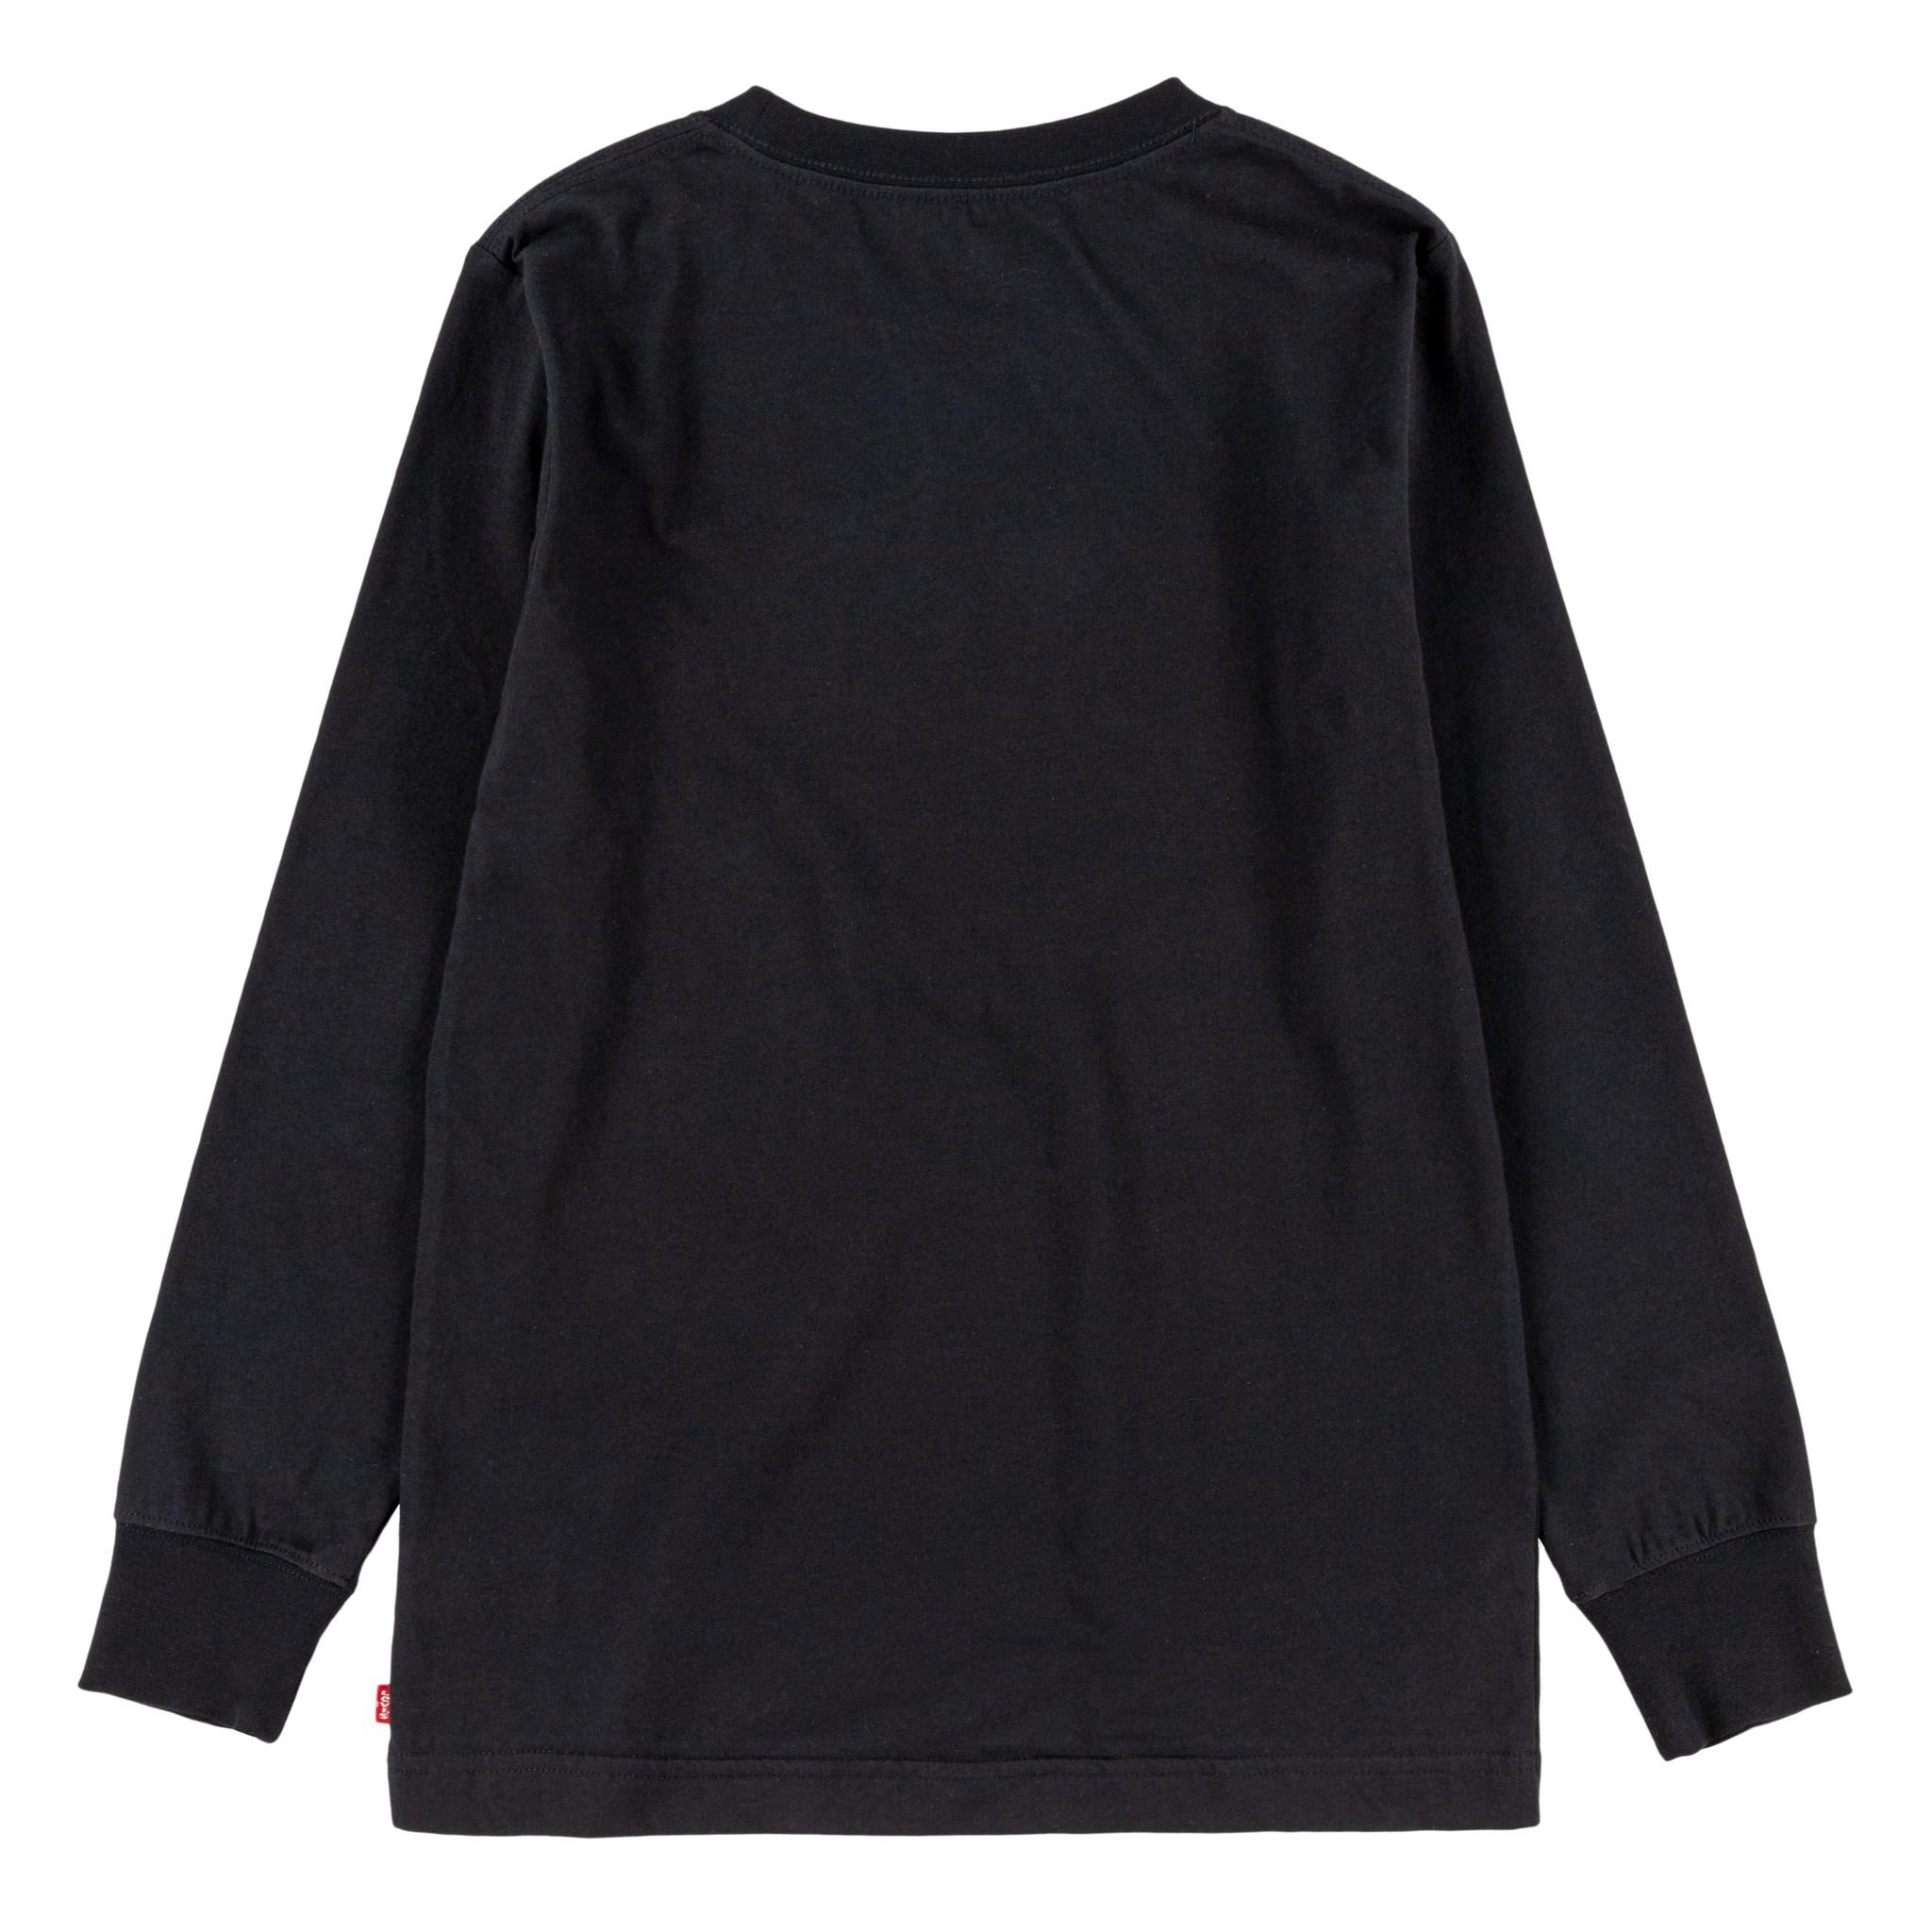 Levi's t-shirt| graphic black